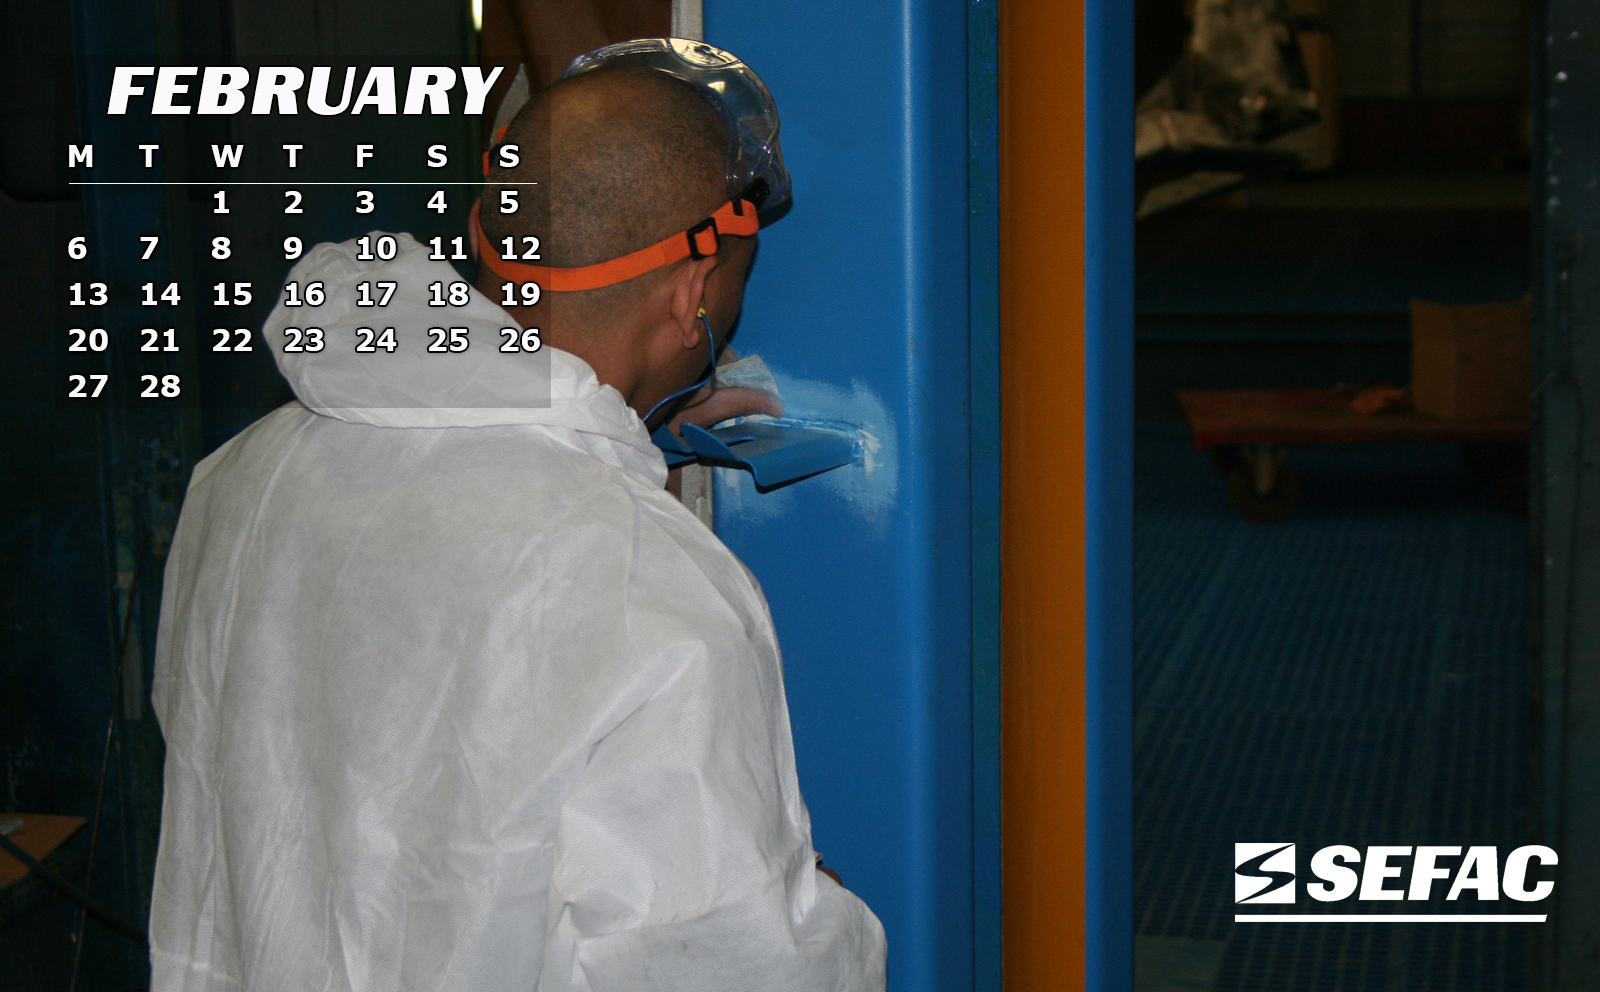 2017-02-Wallpaper-En-Manufacturer